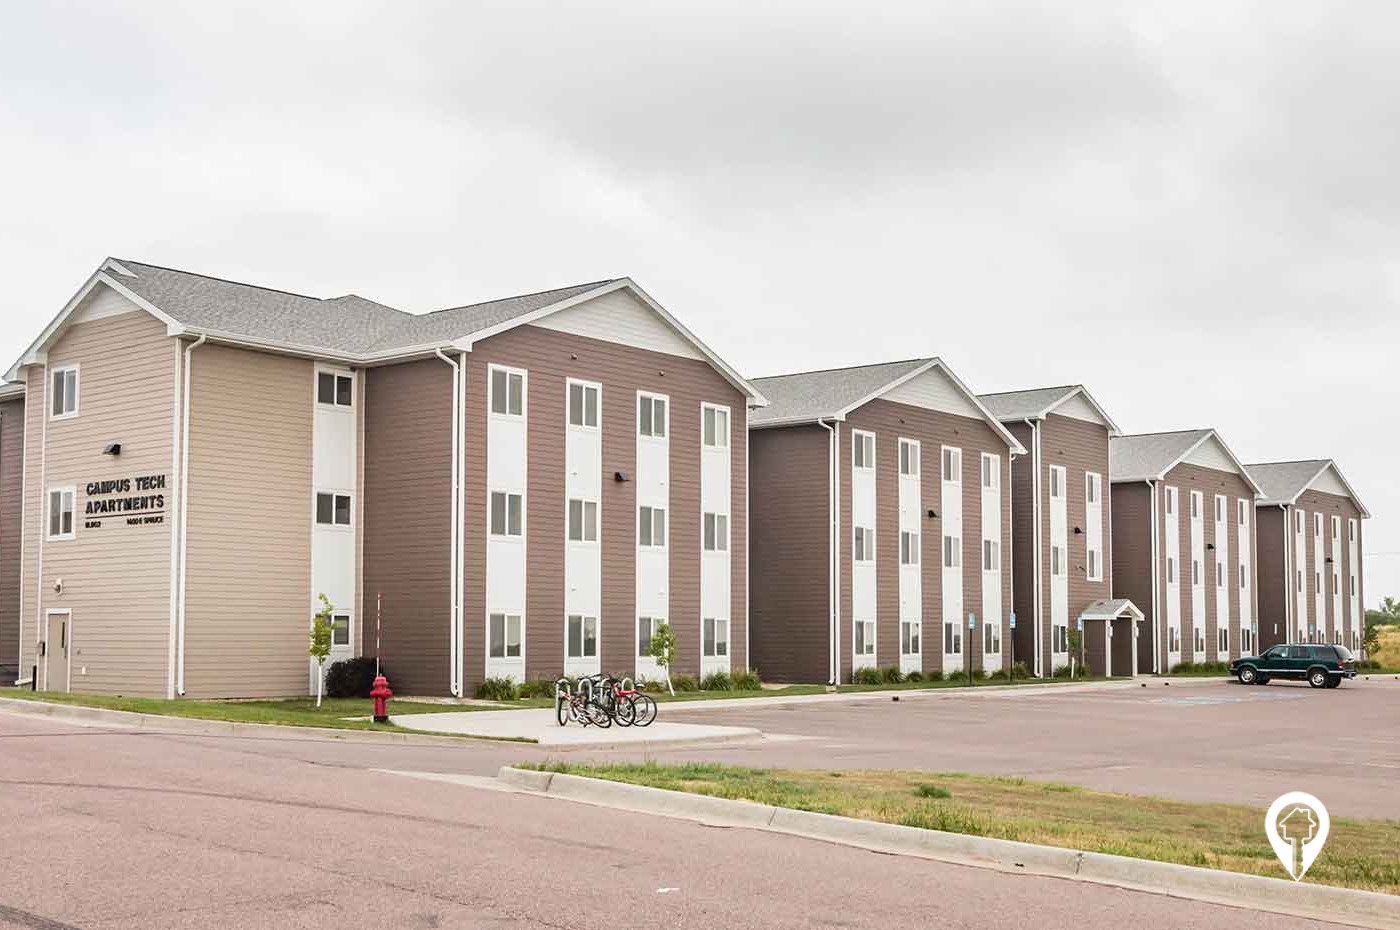 Campus Tech Apartments